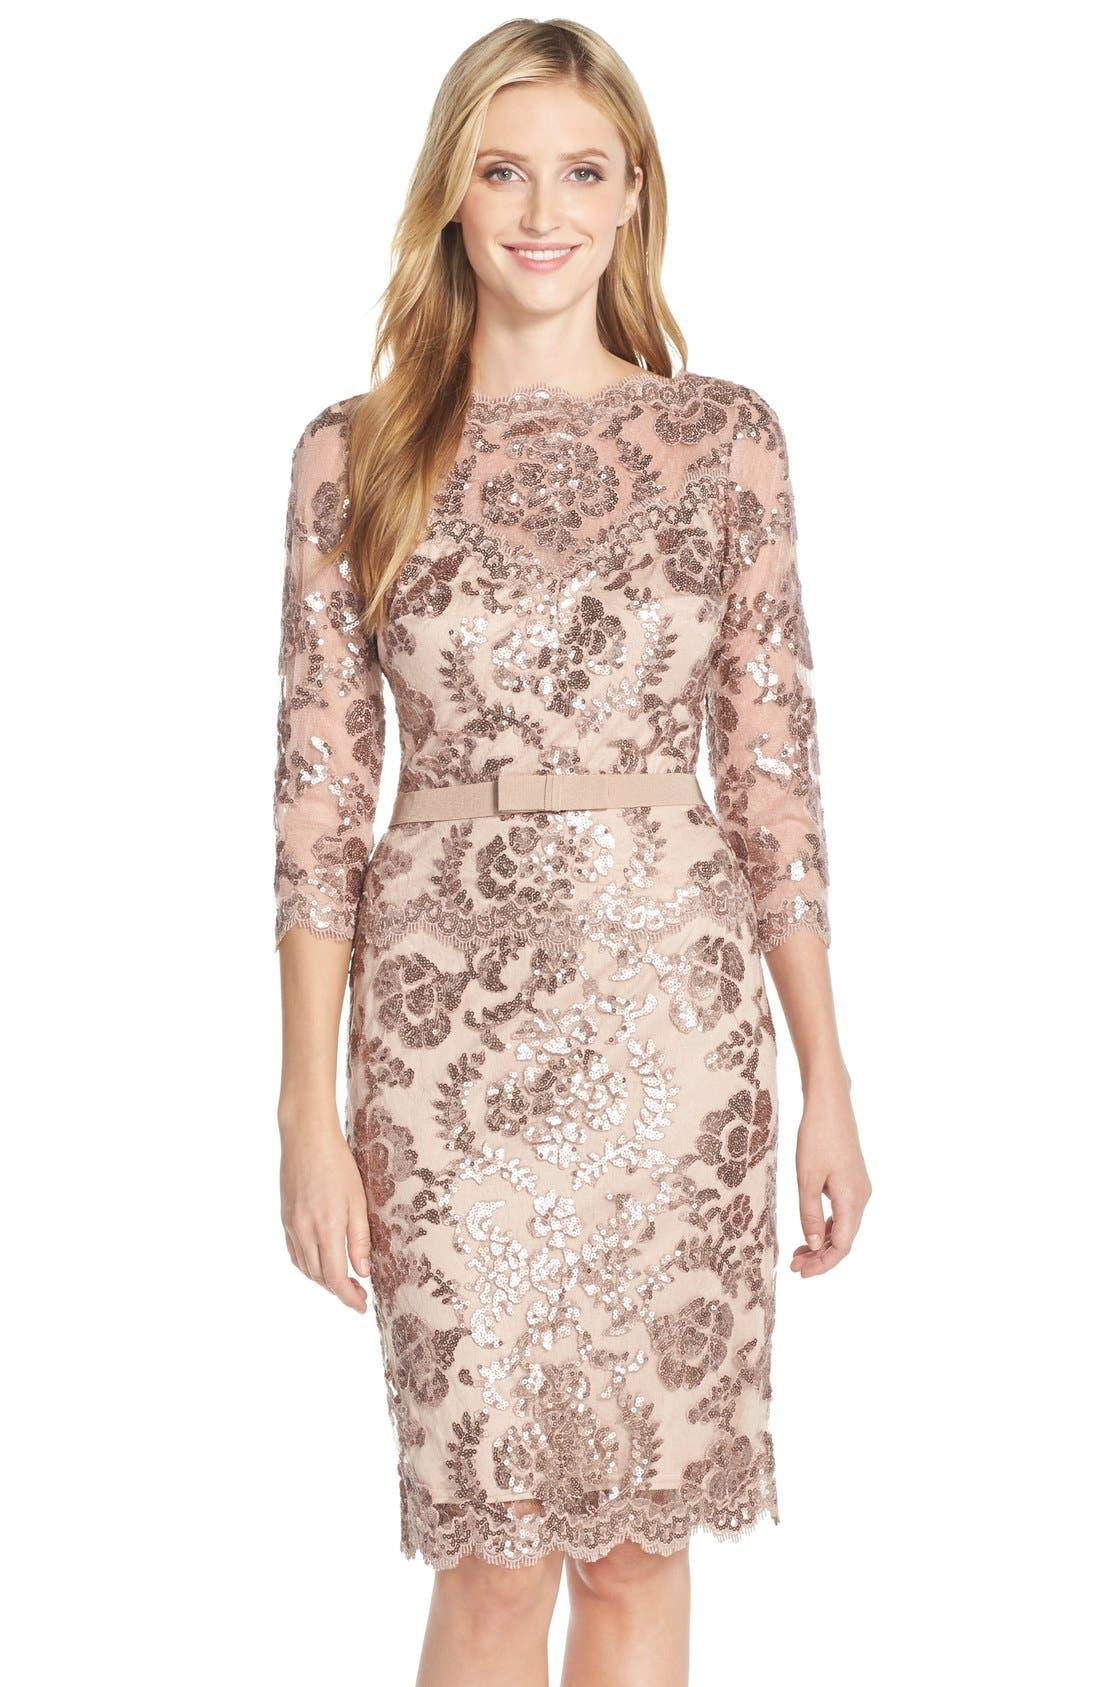 Alternate Image 1 Selected - Tadashi Shoji Embroidered Lace Belted Dress (Regular & Petite)